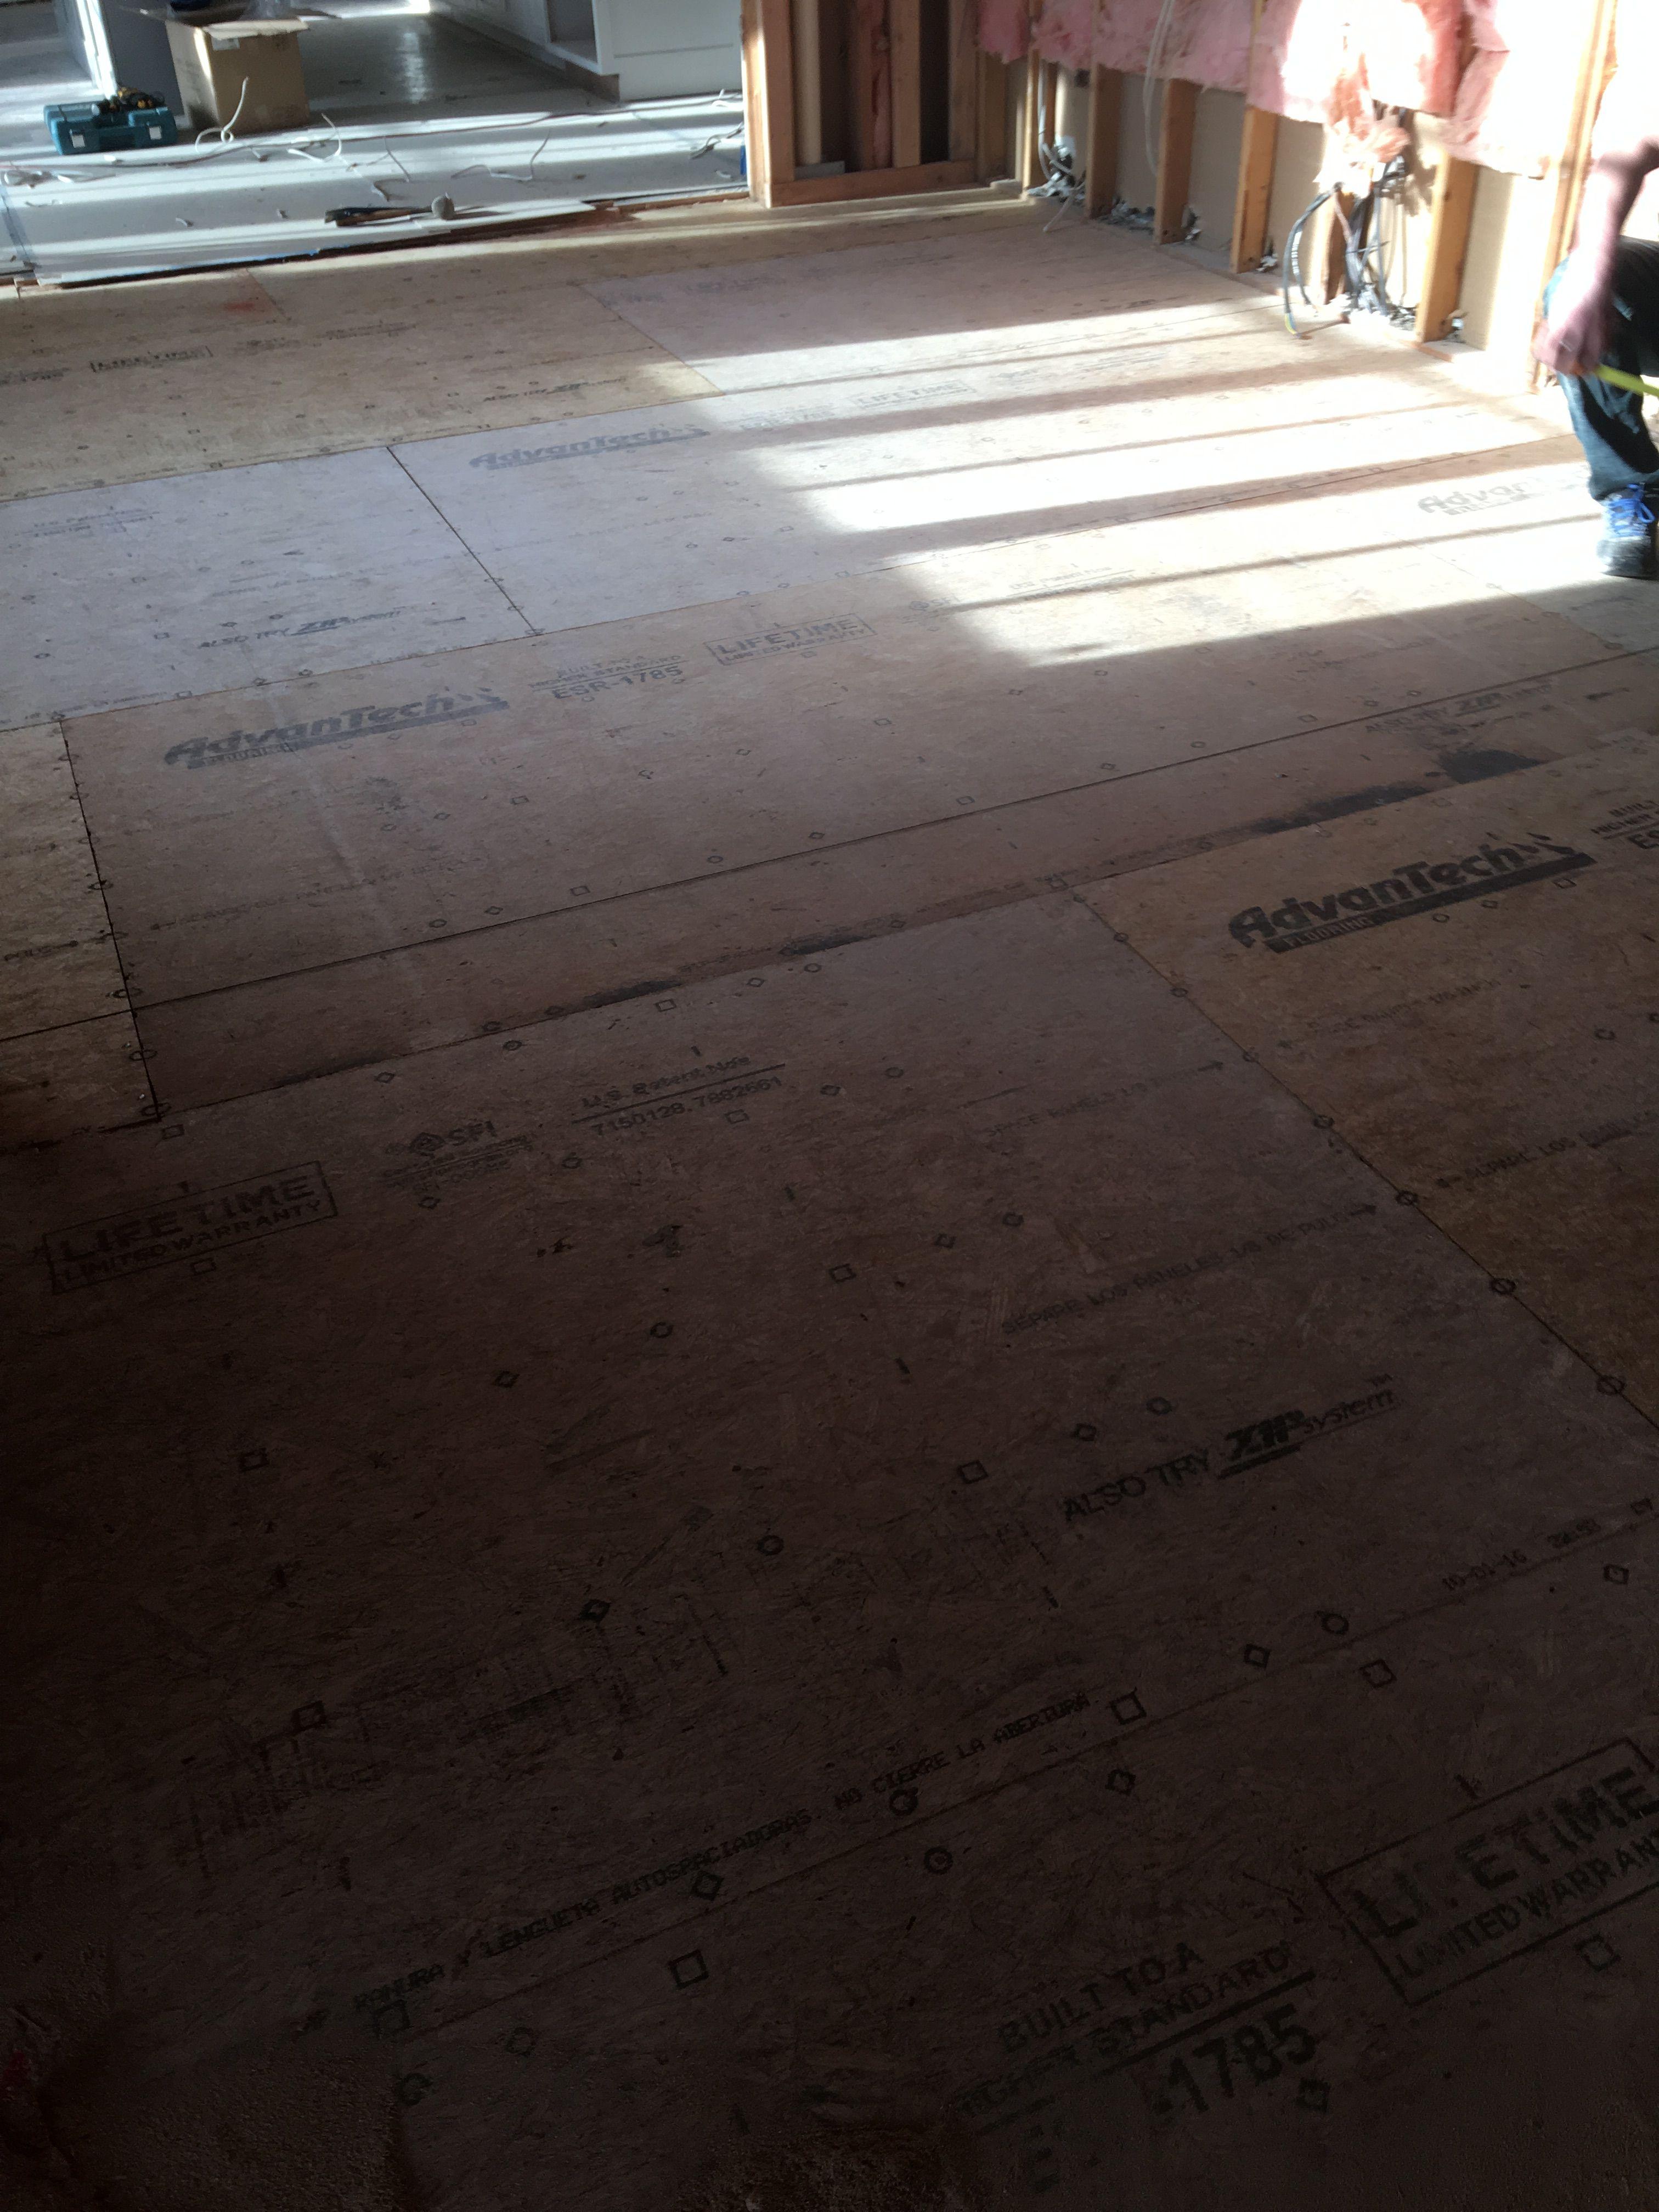 For more information call (908) 232-6600 #floorsanding #floorsander  #NJArchitect #floorlife  #entrepreneur  #remodeling #inspiration #decor #contemporary #homedecor #interiordesign #ideas #diy #fabulousfloors #green #woodwork #flooring #tristatearea #suburbs #lifestyle #luxury #lovewhatido #customfloors #hardwoodfloors #trends #americanmade #carpentry #NYArchitect